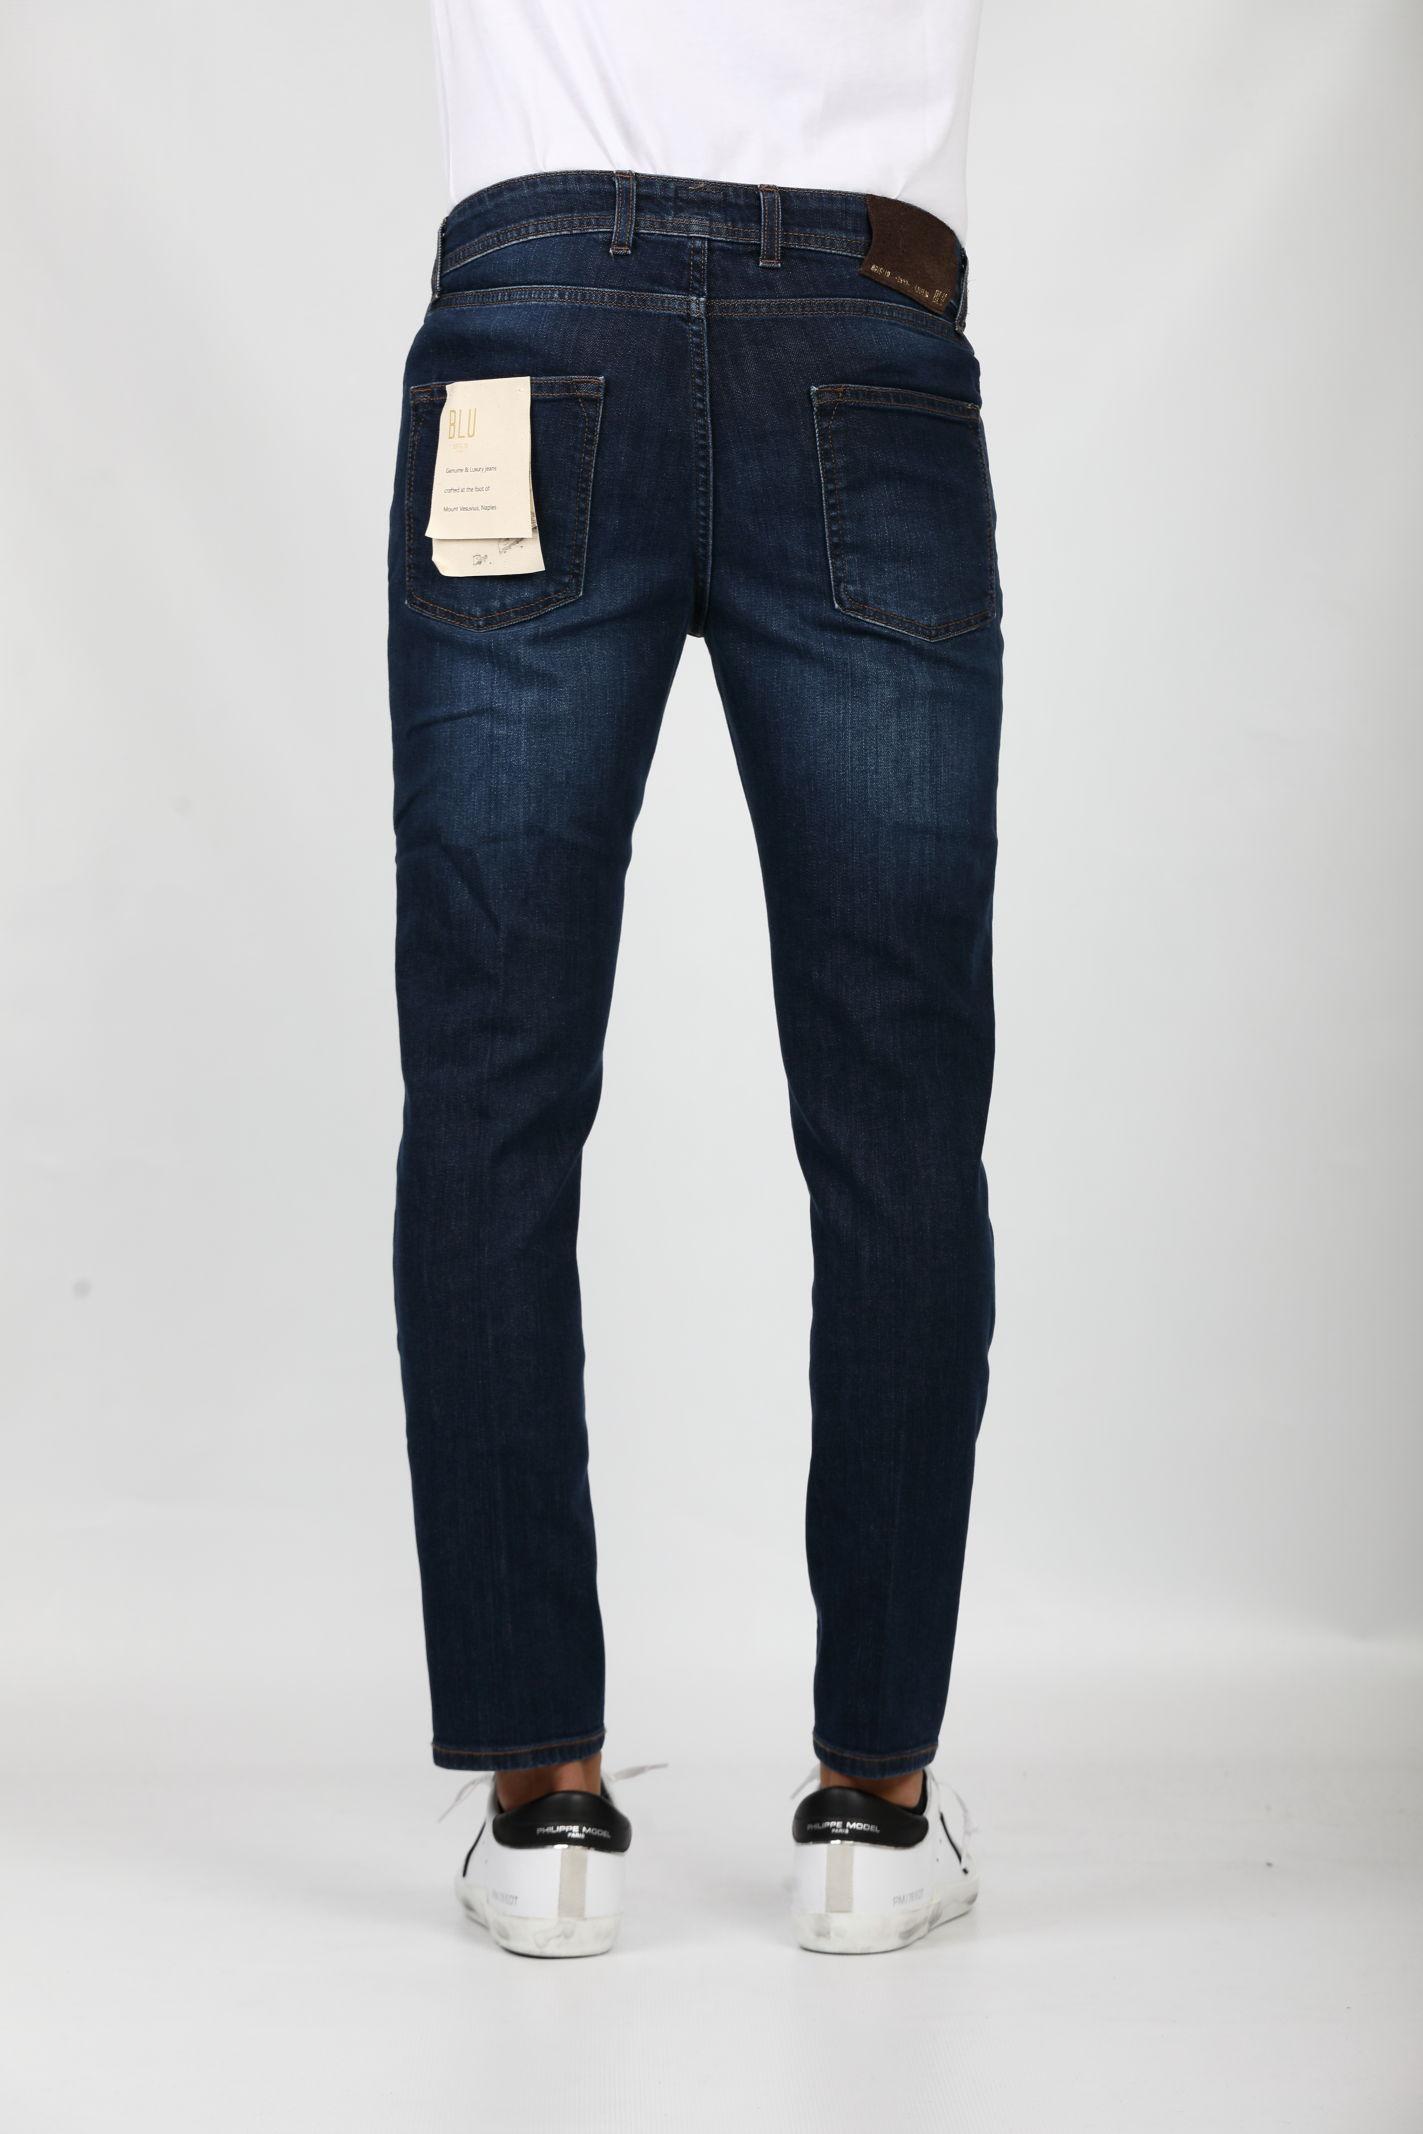 RIBOT JEANS BRIGLIA   Jeans   RIBOT-C-42101611